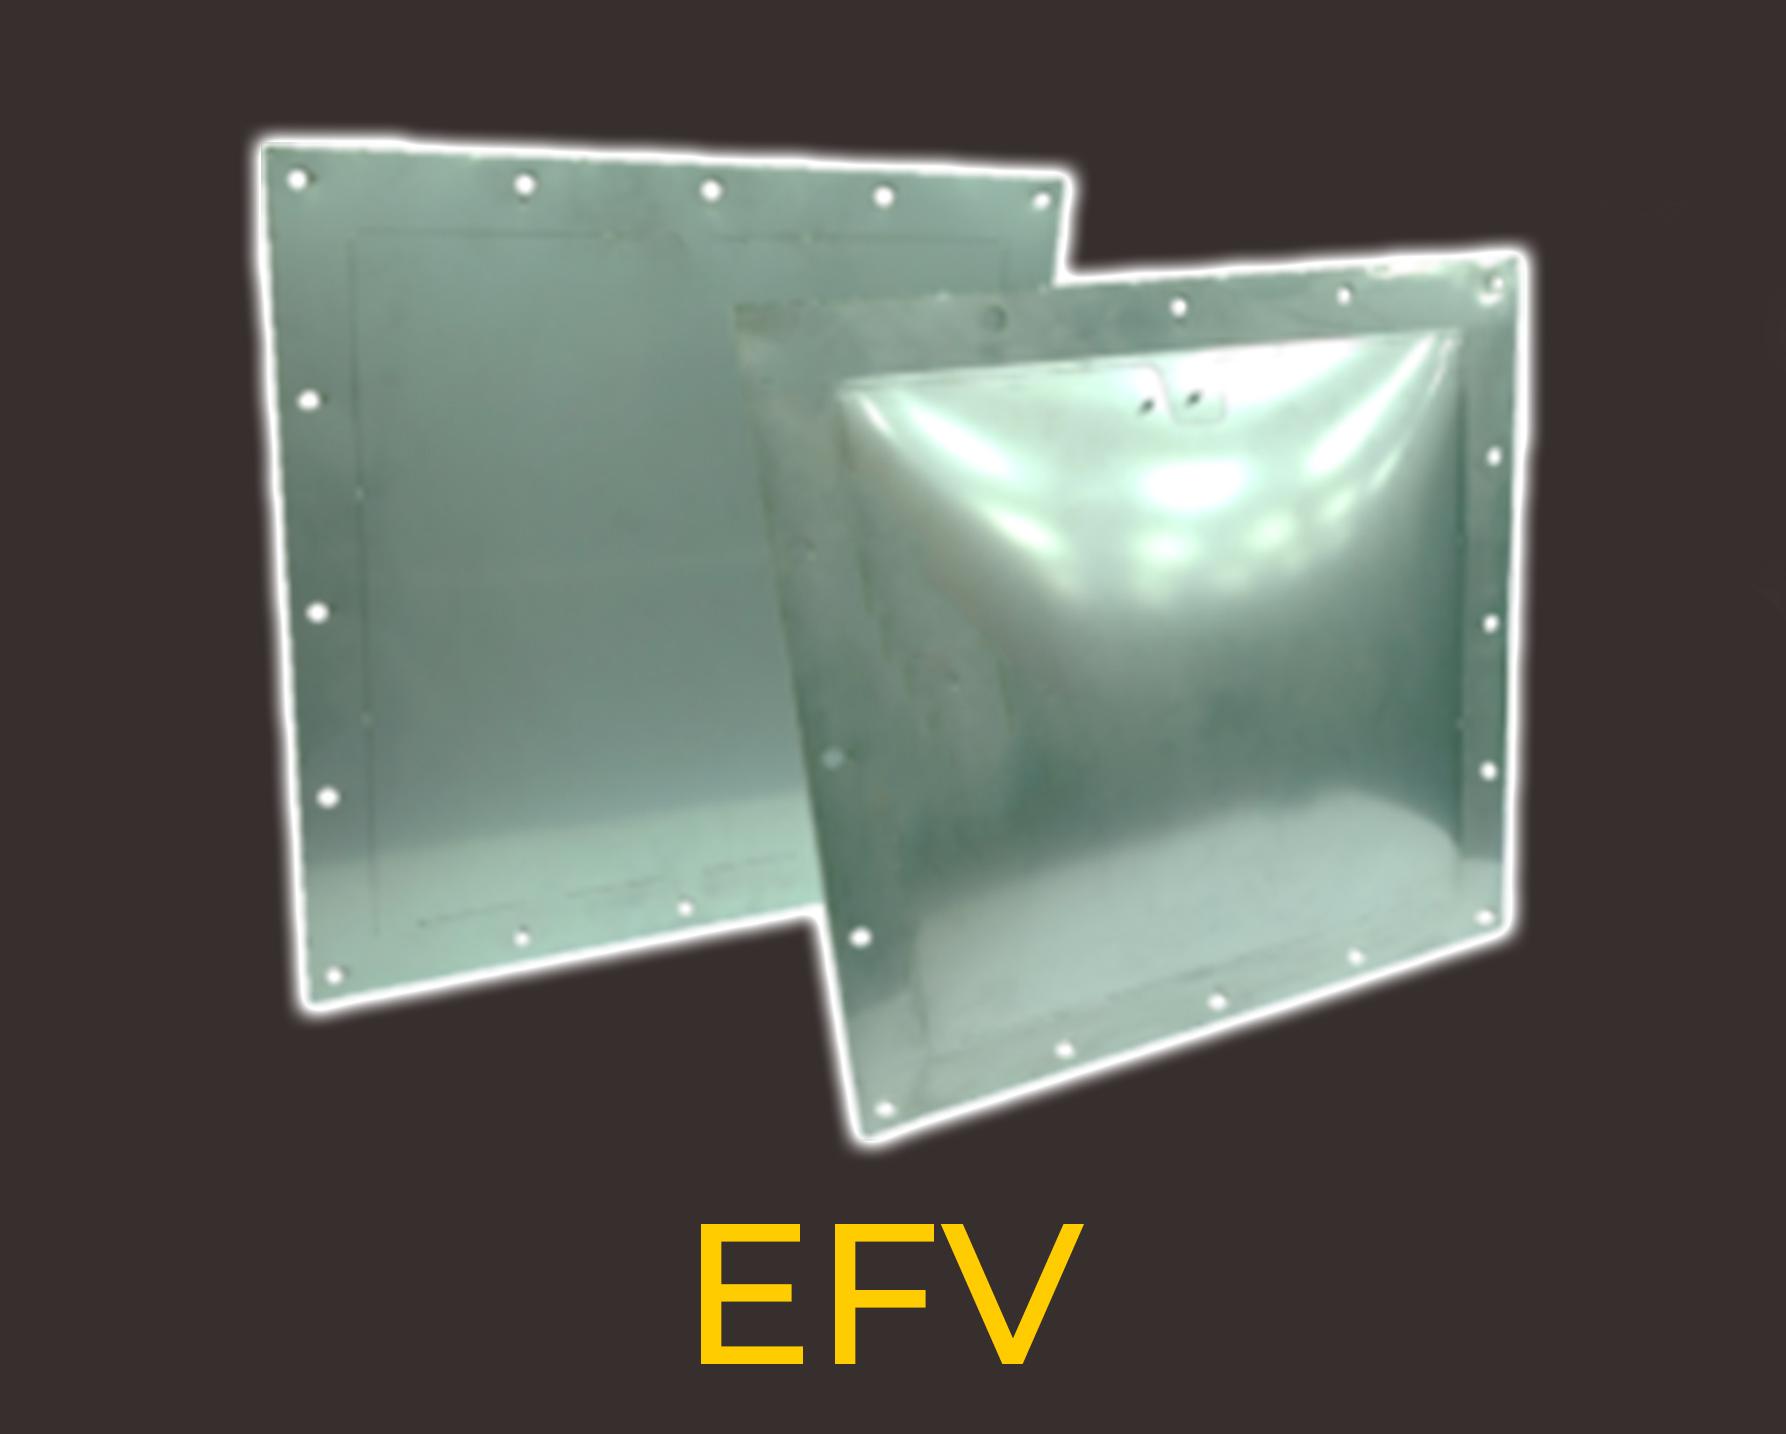 Explosion venting from Euratax EFV